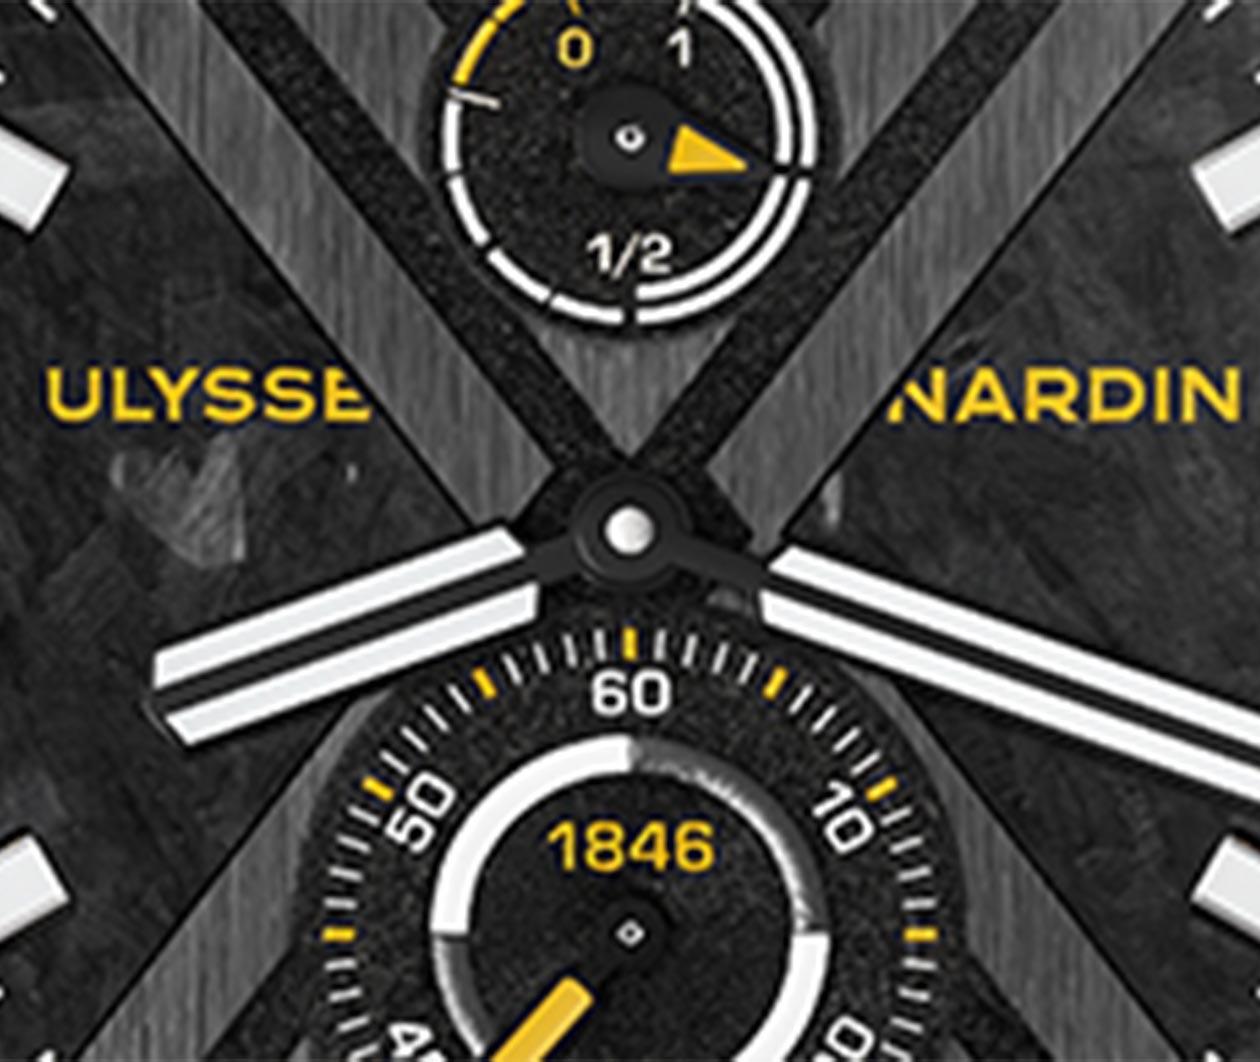 UlysseNardin Diver X42mm 1183170LE92CAP Carousel 4 FINAL